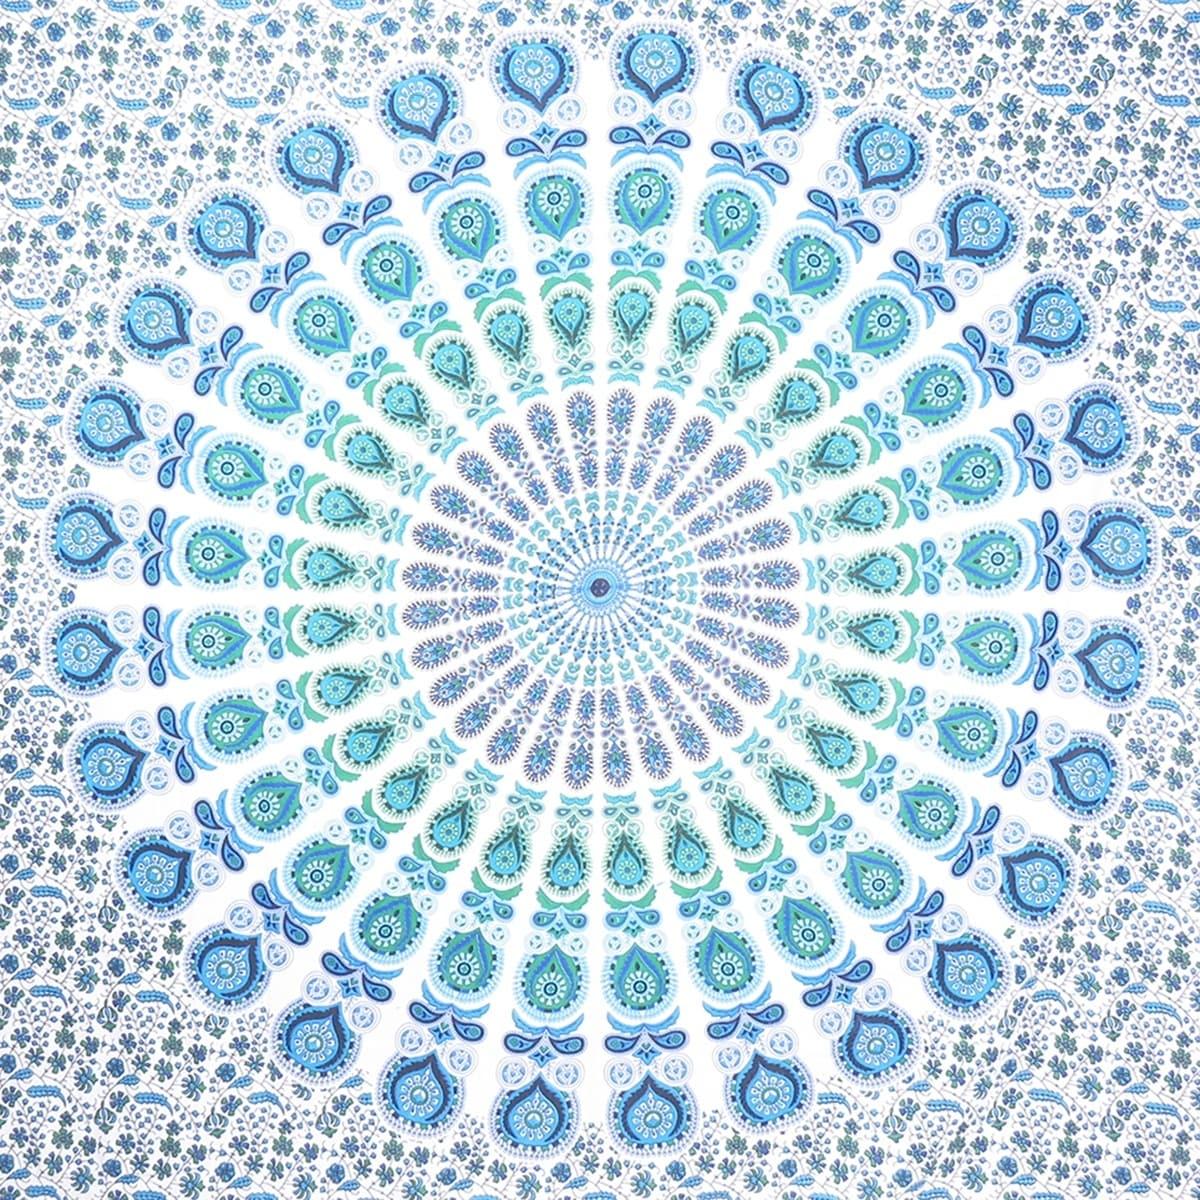 Home Decor Blue Turquoise Color Mandala Indian Hippie Wall Tapestry Room Decor Bohemian Art Home Garden Marketplatforms Com